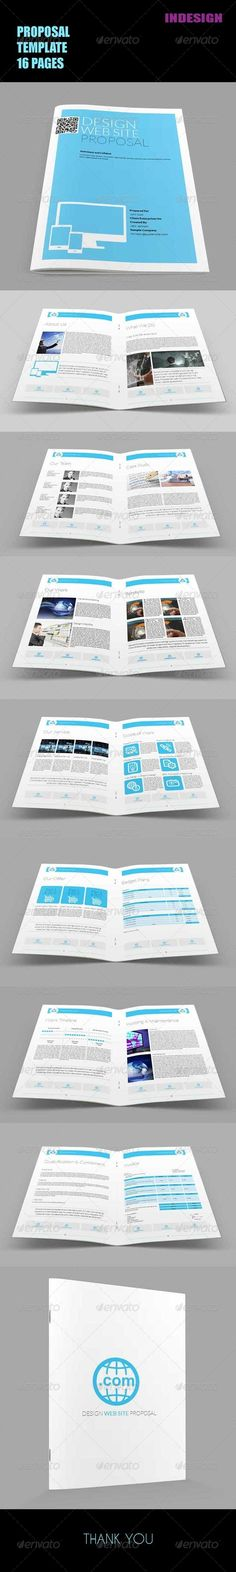 Always Management (Proposal) Via Behance WEBDESIGN Pinterest - management proposal